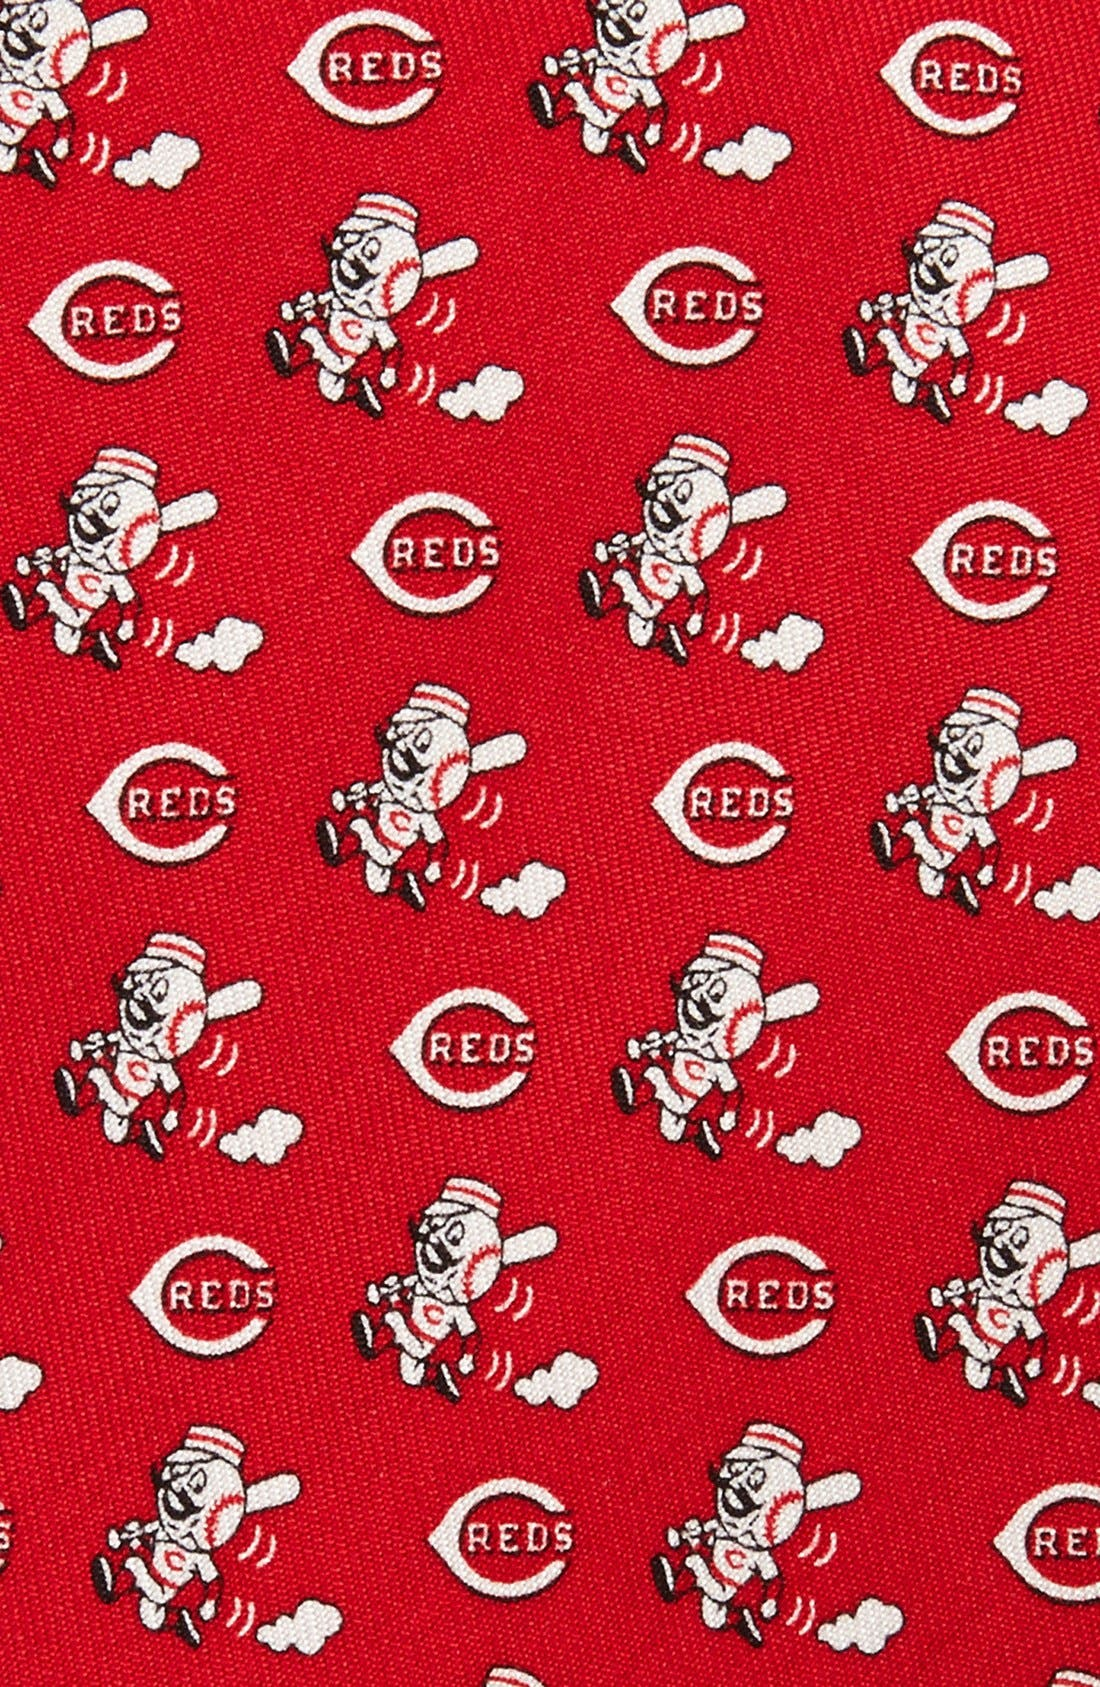 'Cincinnati Reds - MLB' Print Silk Tie,                             Alternate thumbnail 2, color,                             RED